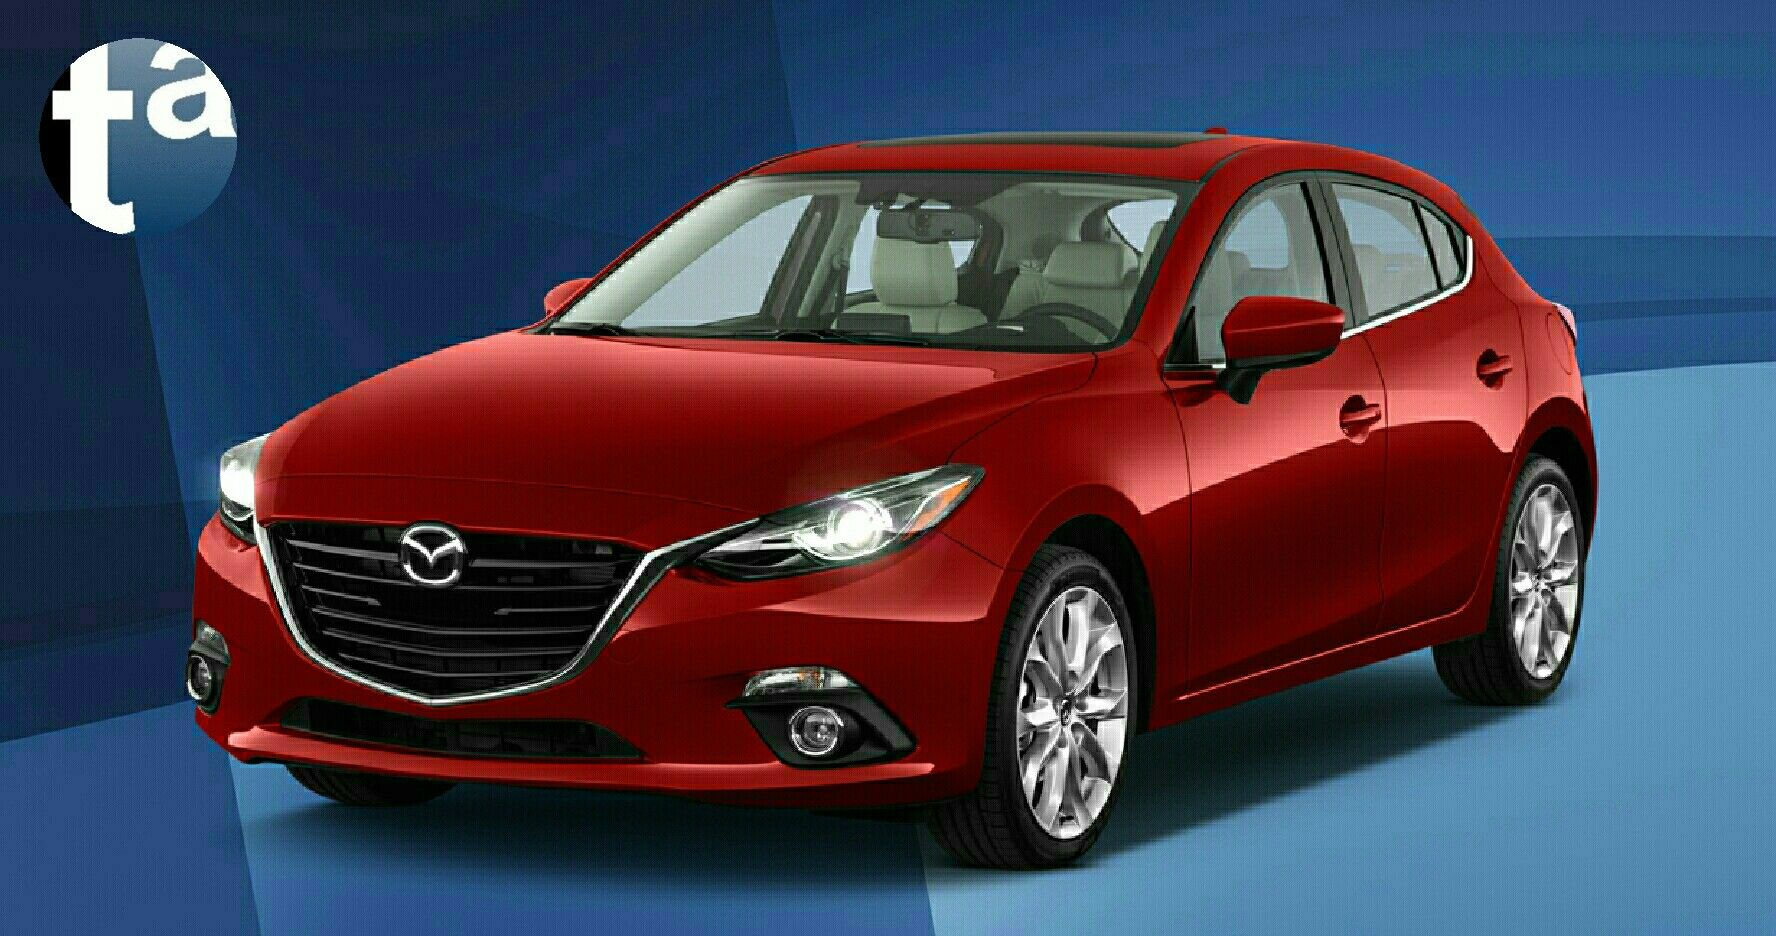 468 BLUE HARMONY Automotive OffRoad Mazda Mazda3 5